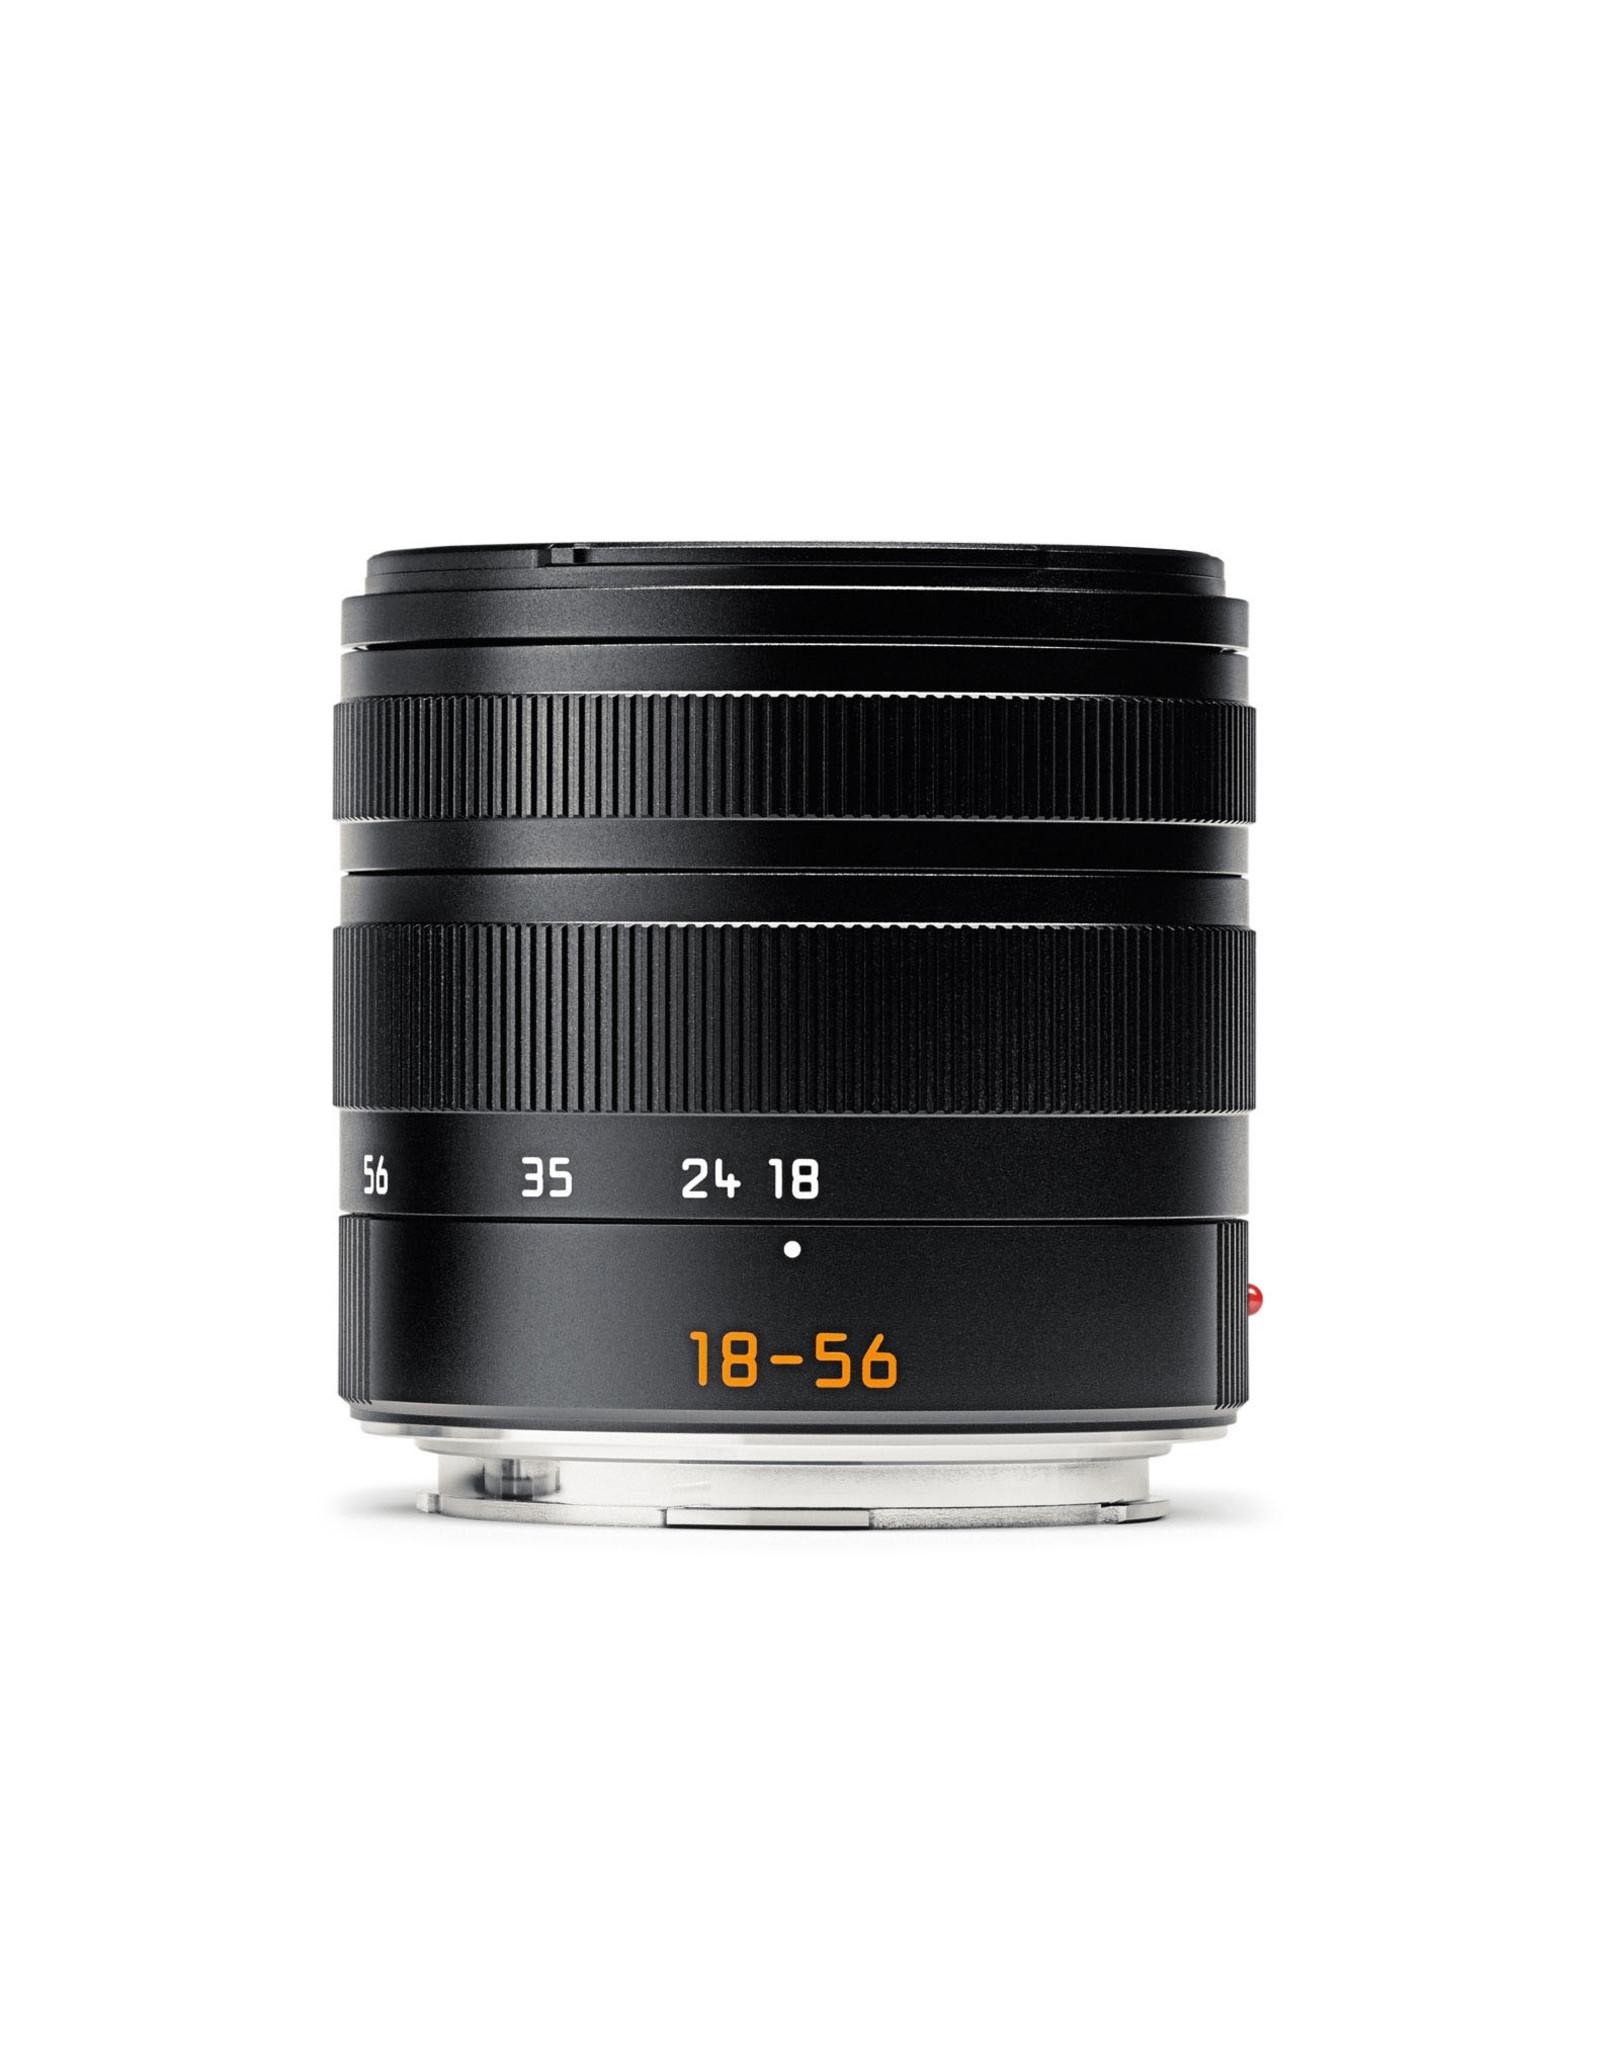 Leica Leica 18-56mm f3.5-5.6 Vario-Elmar-TL ASPH Black   110-80